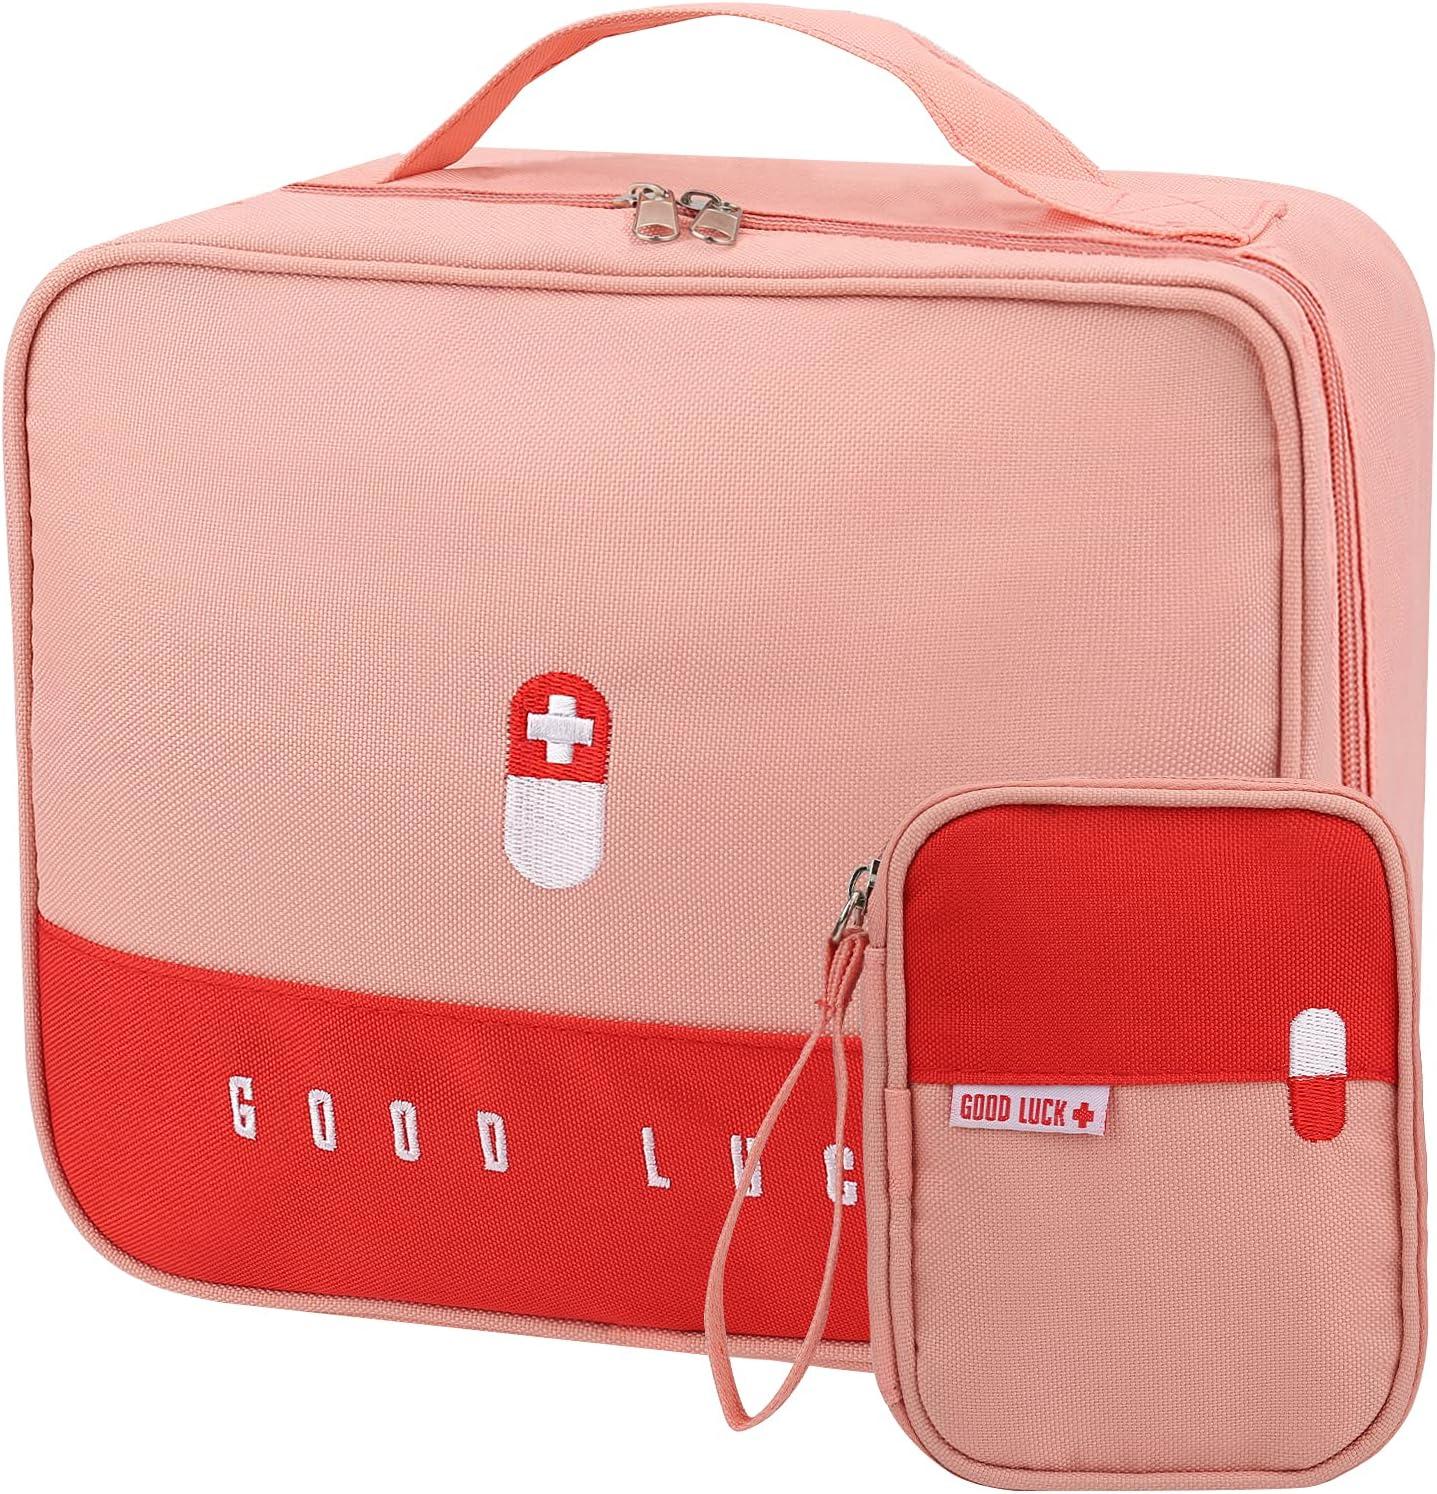 2PCS Botiquín médico vacío VVEMERK estuche medicamentos neceser de medicamentos para poder incluir botiquin de primeros auxilios maletin portátil para llevar medicinas Rosa